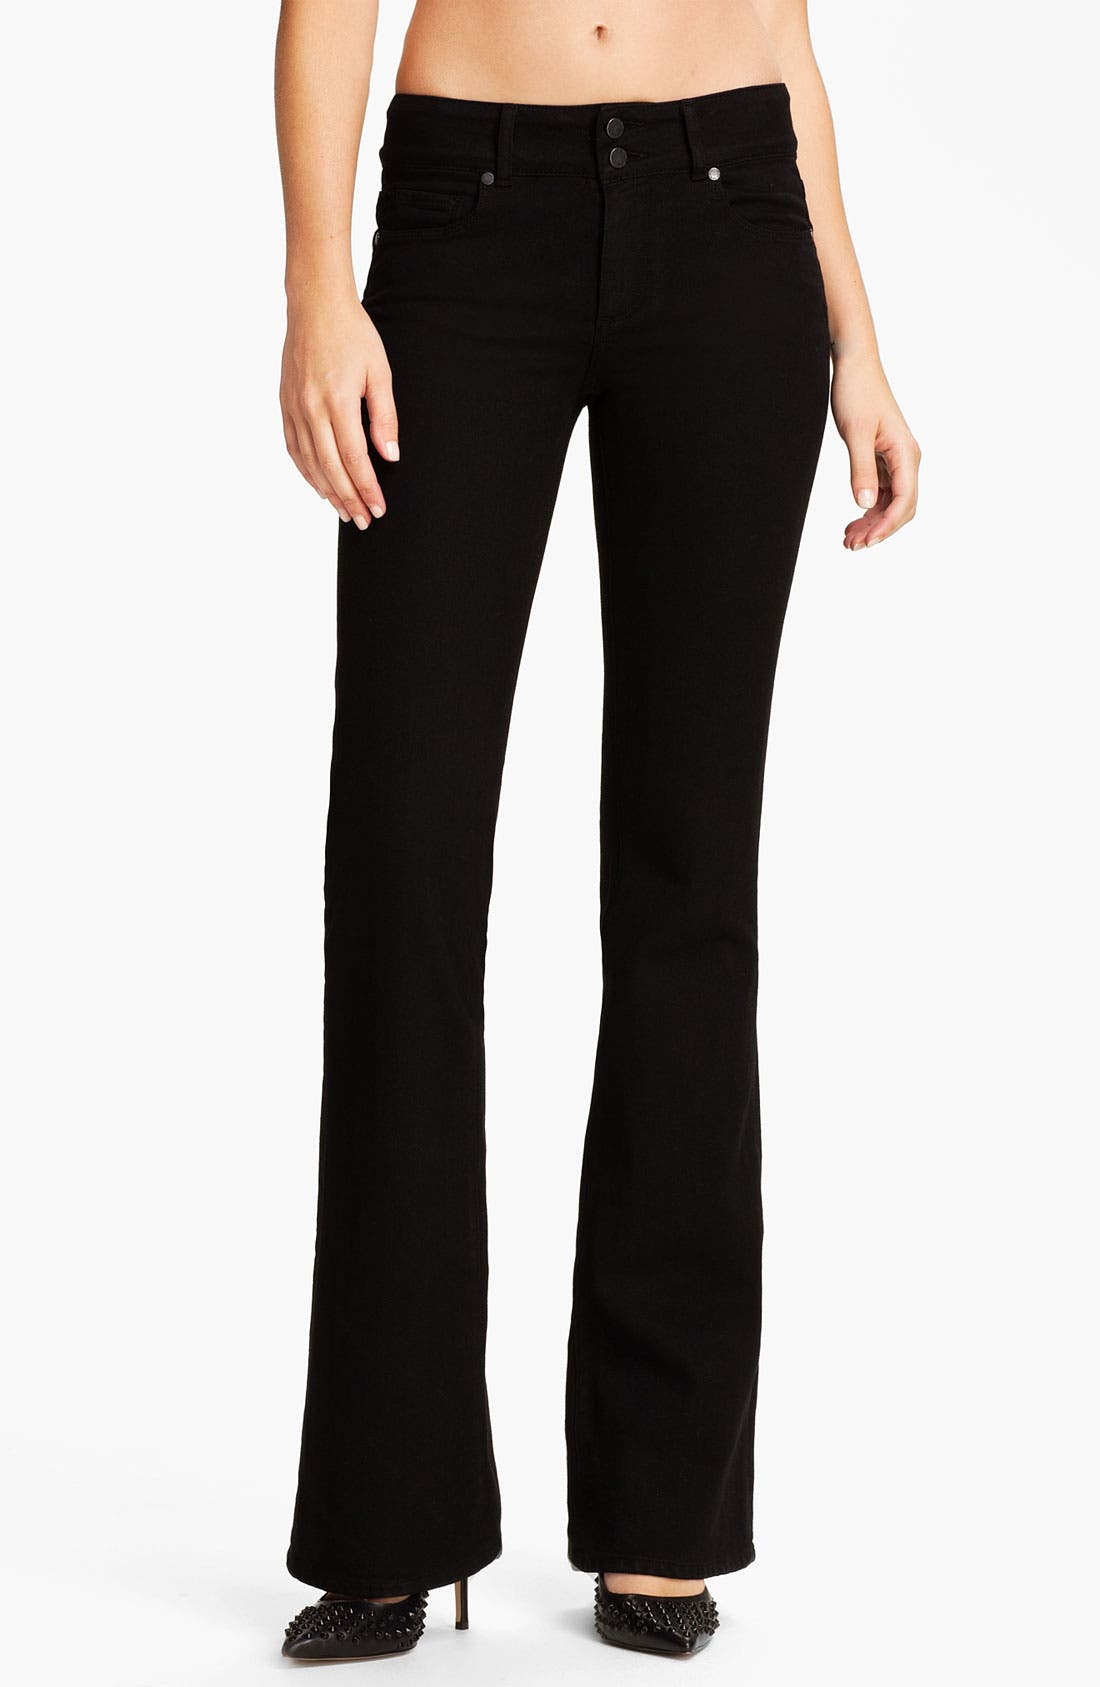 Alternate Image 1 Selected - Paige Denim 'Hidden Hills' Bootcut Stretch Jeans (Jet Black)